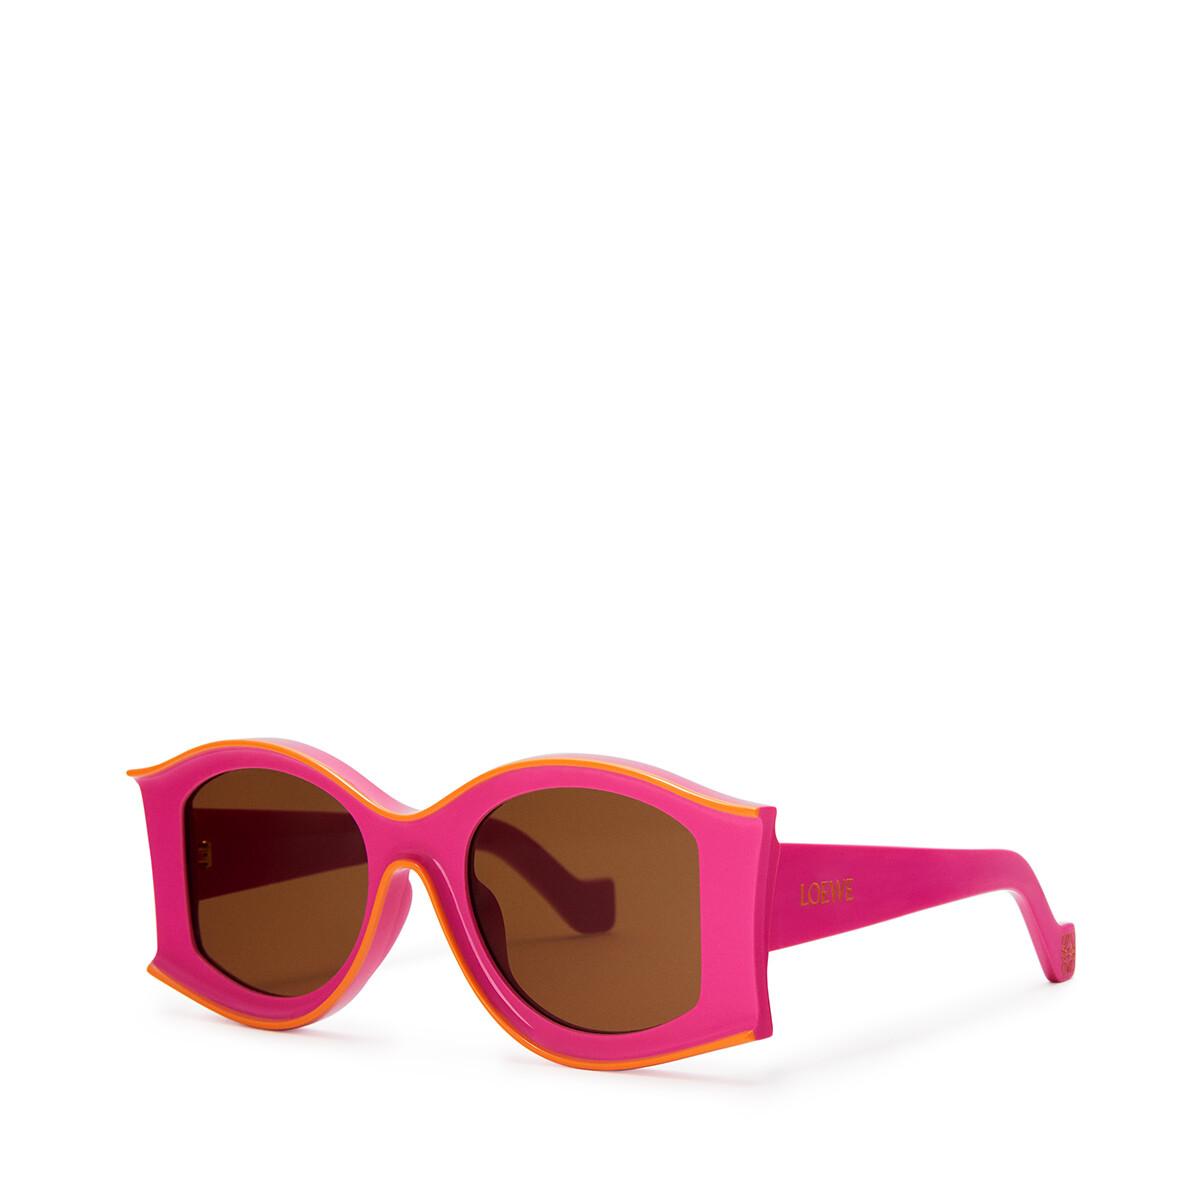 LOEWE Large Pula's Ibiza Sunglasses In Acetate Neon Pink/Neon Orange front